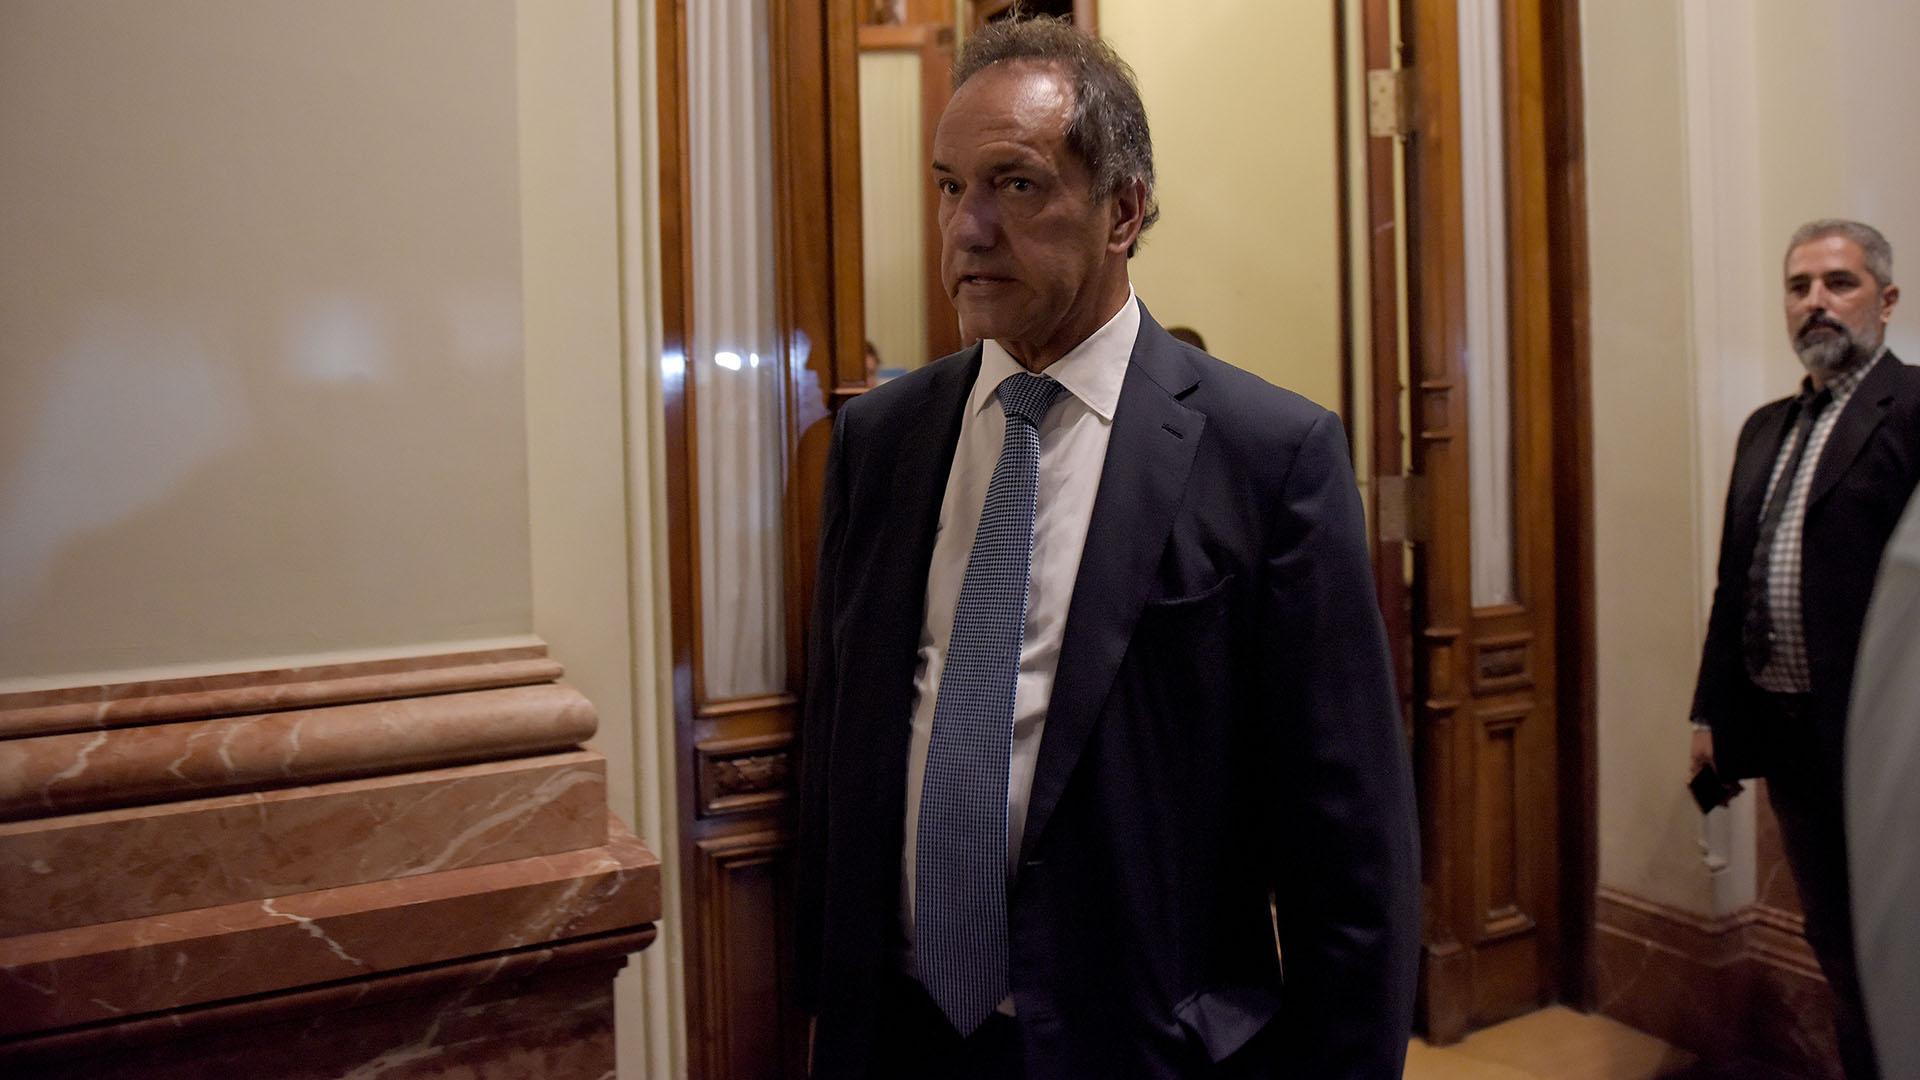 El diputado Daniel Scioli (Frente para la Victoria – PJ)